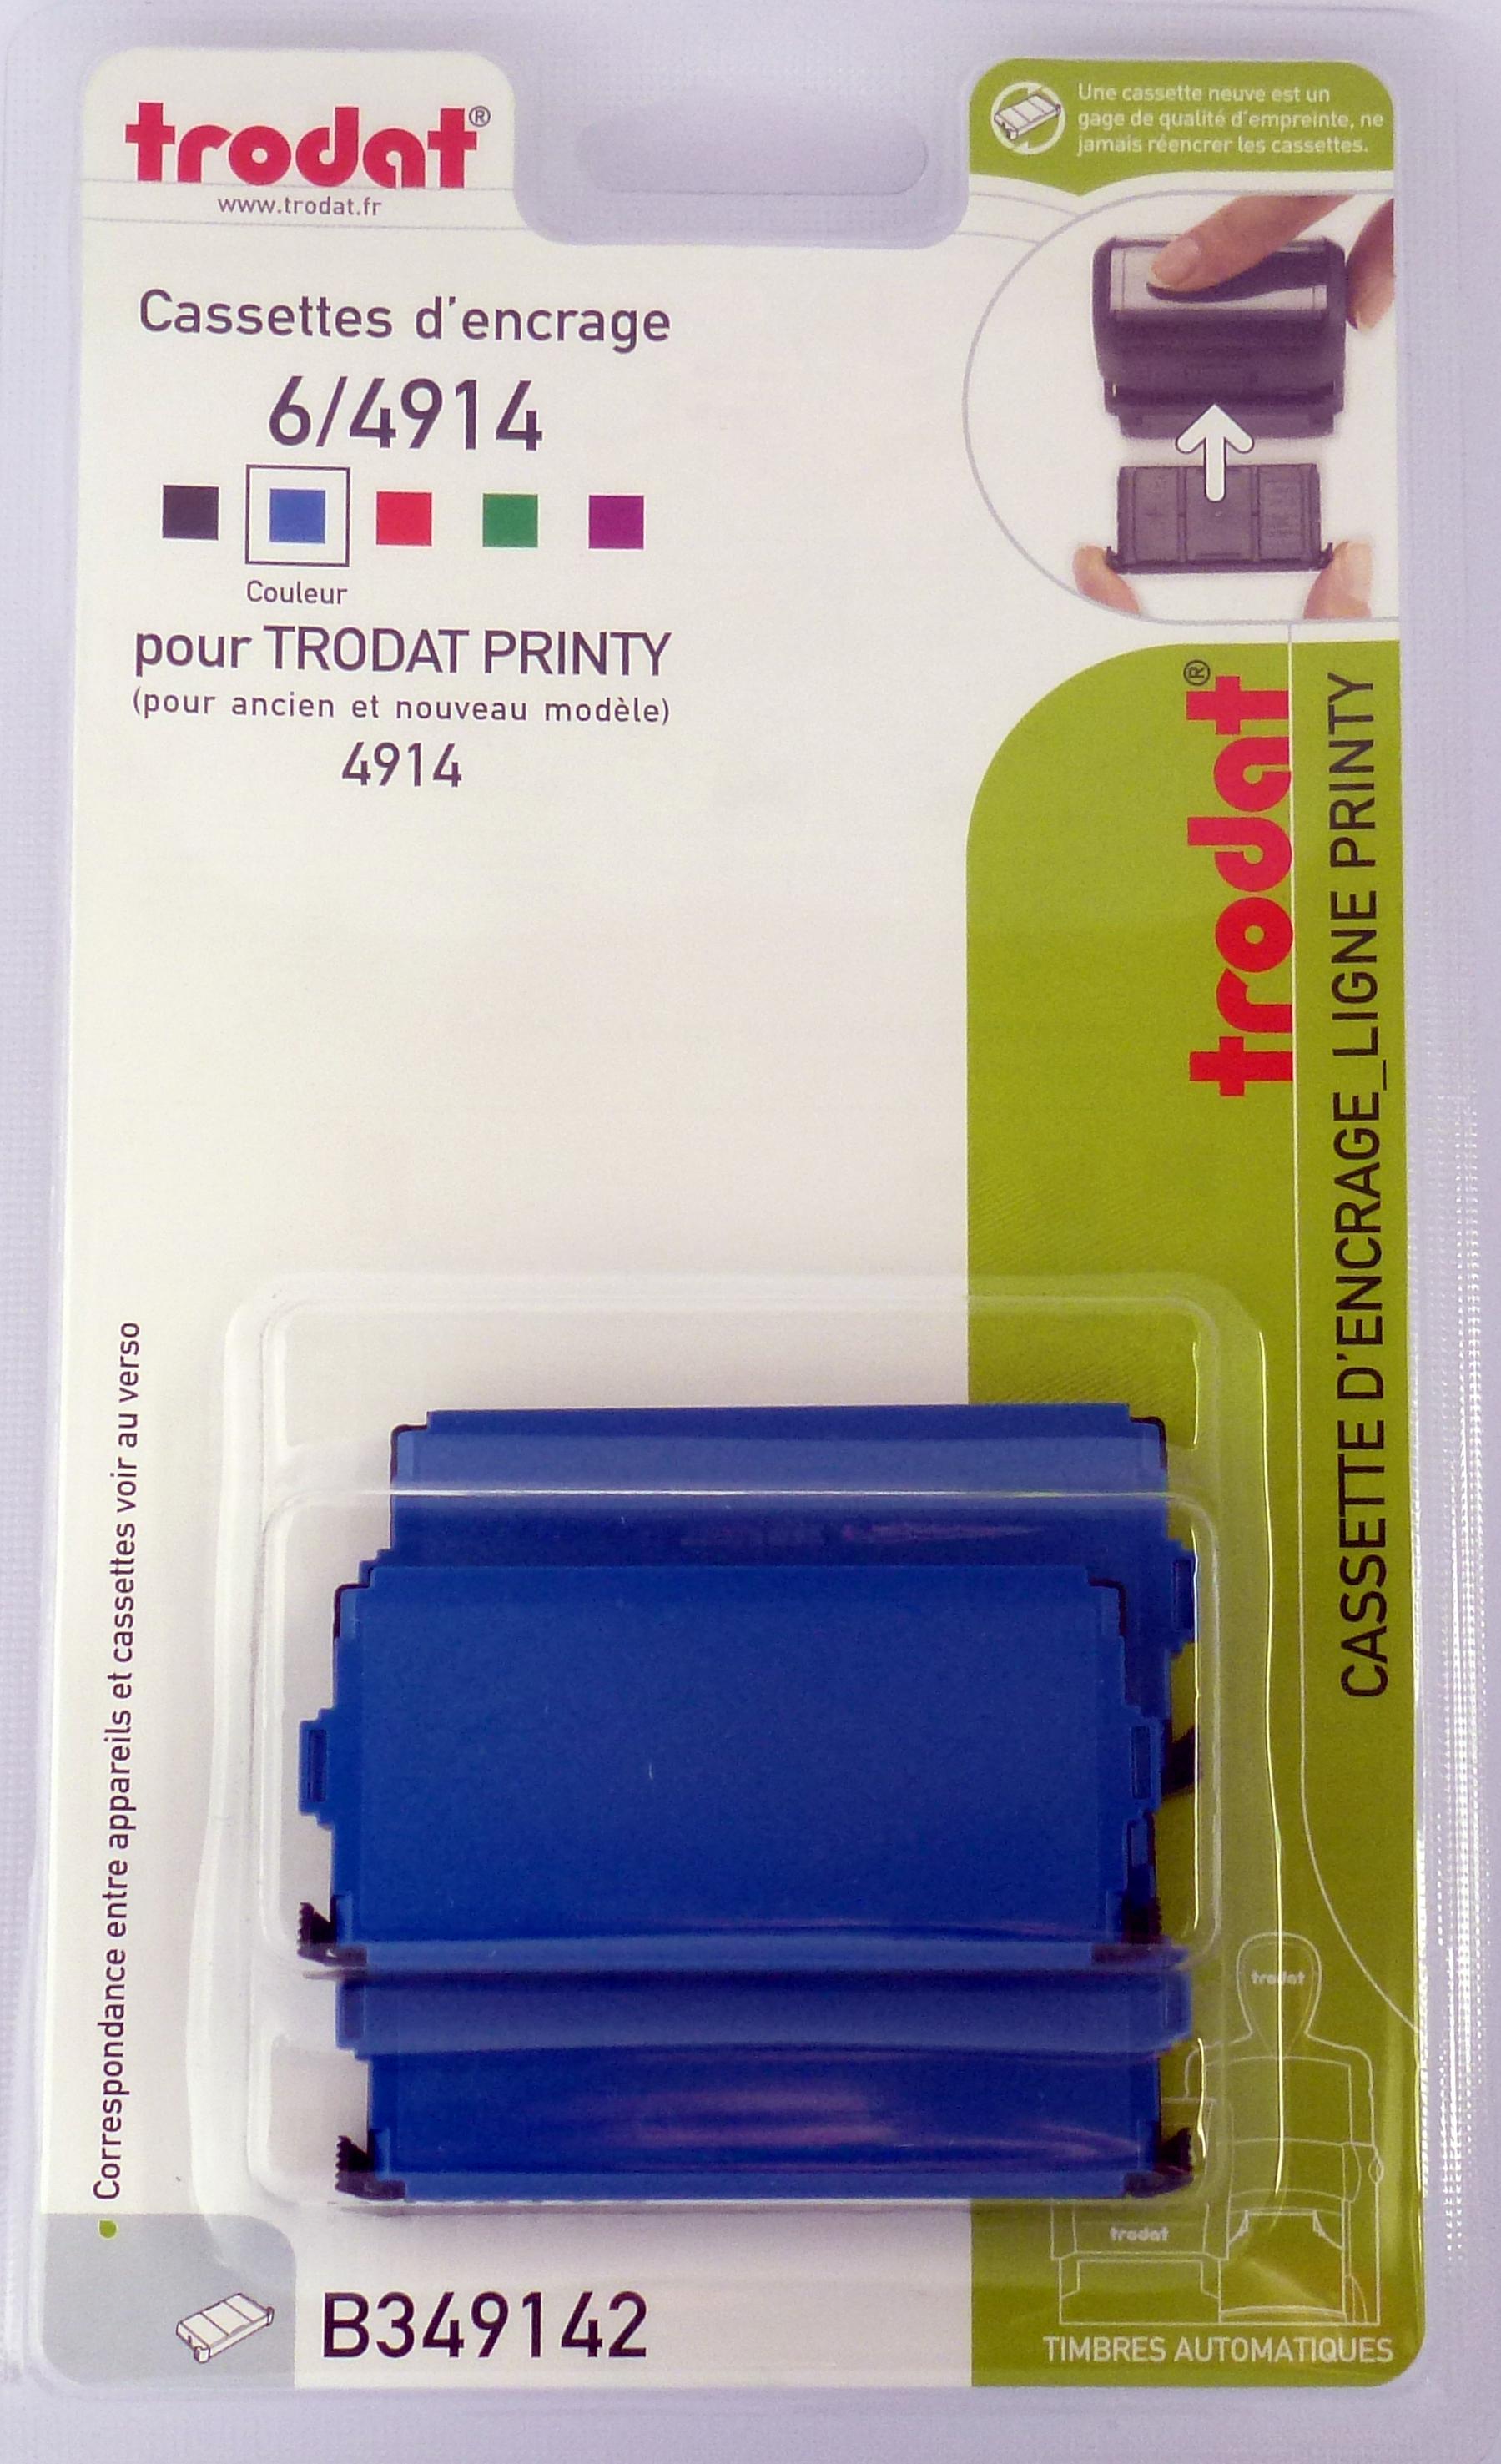 Trodat - 3 Encriers 6/4914 recharges pour tampon Printy 4914 - bleu